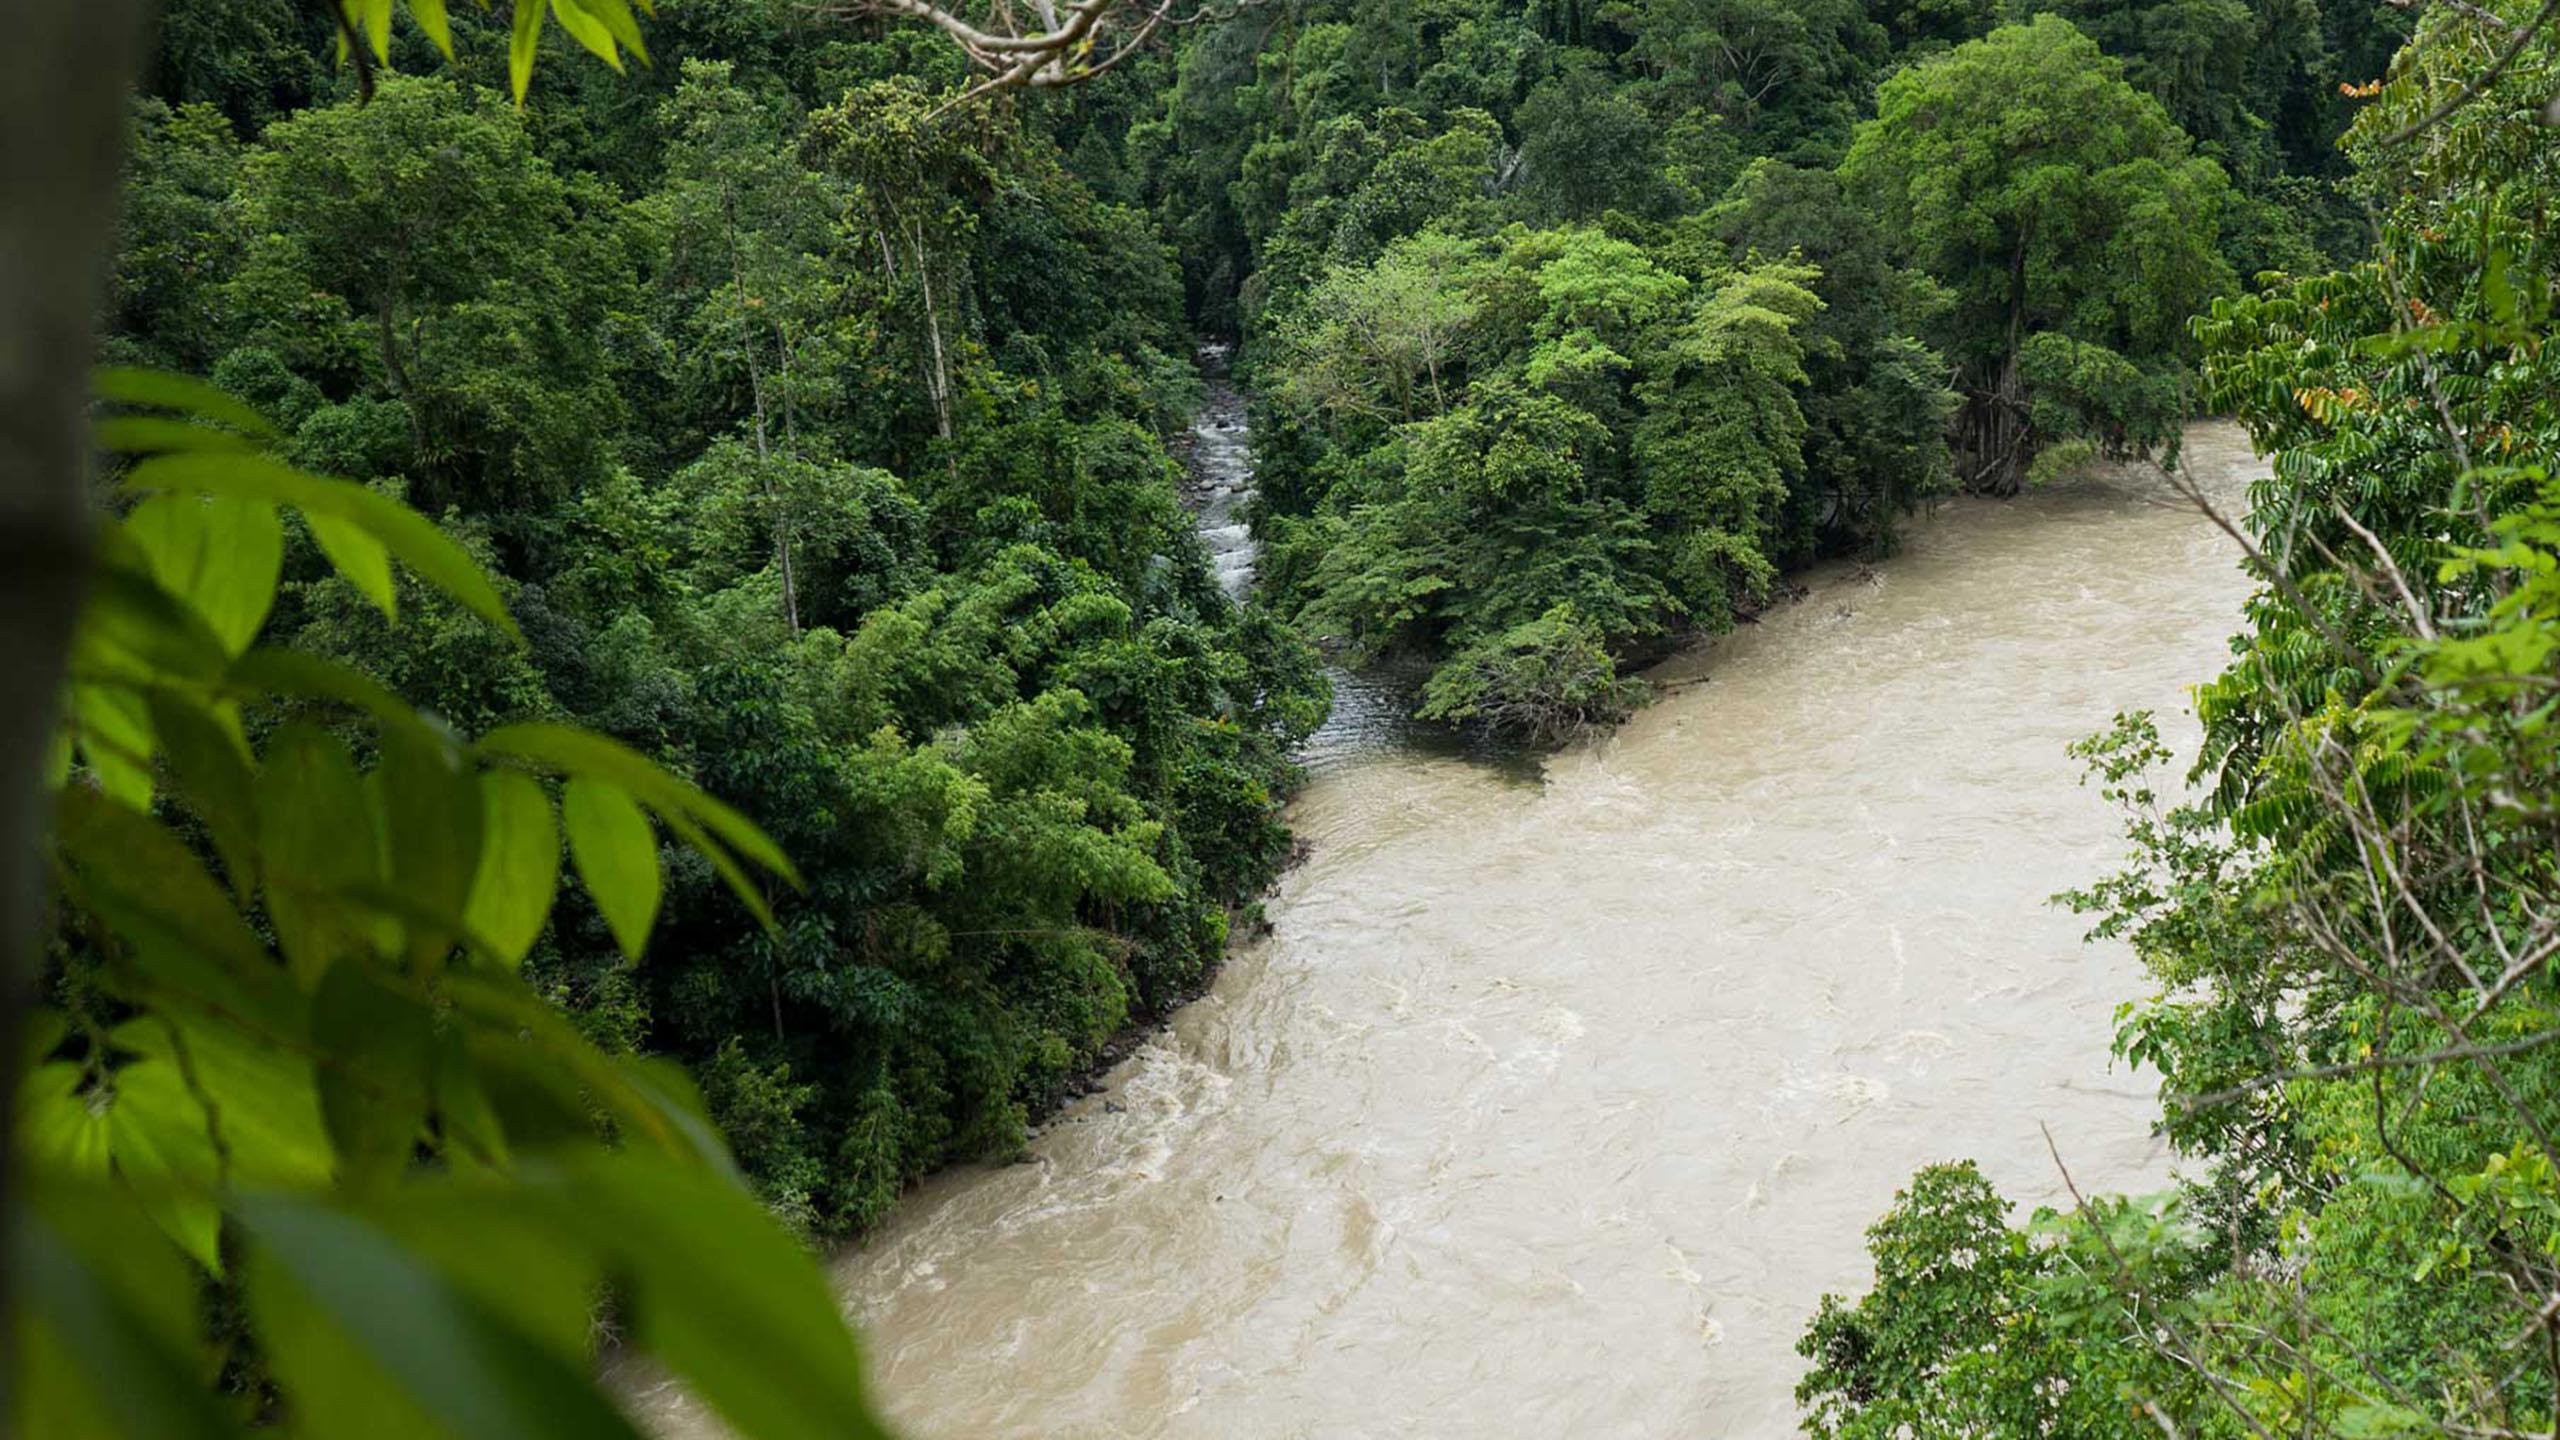 Mandara rivière lore lindu éco-tourisme indonésie